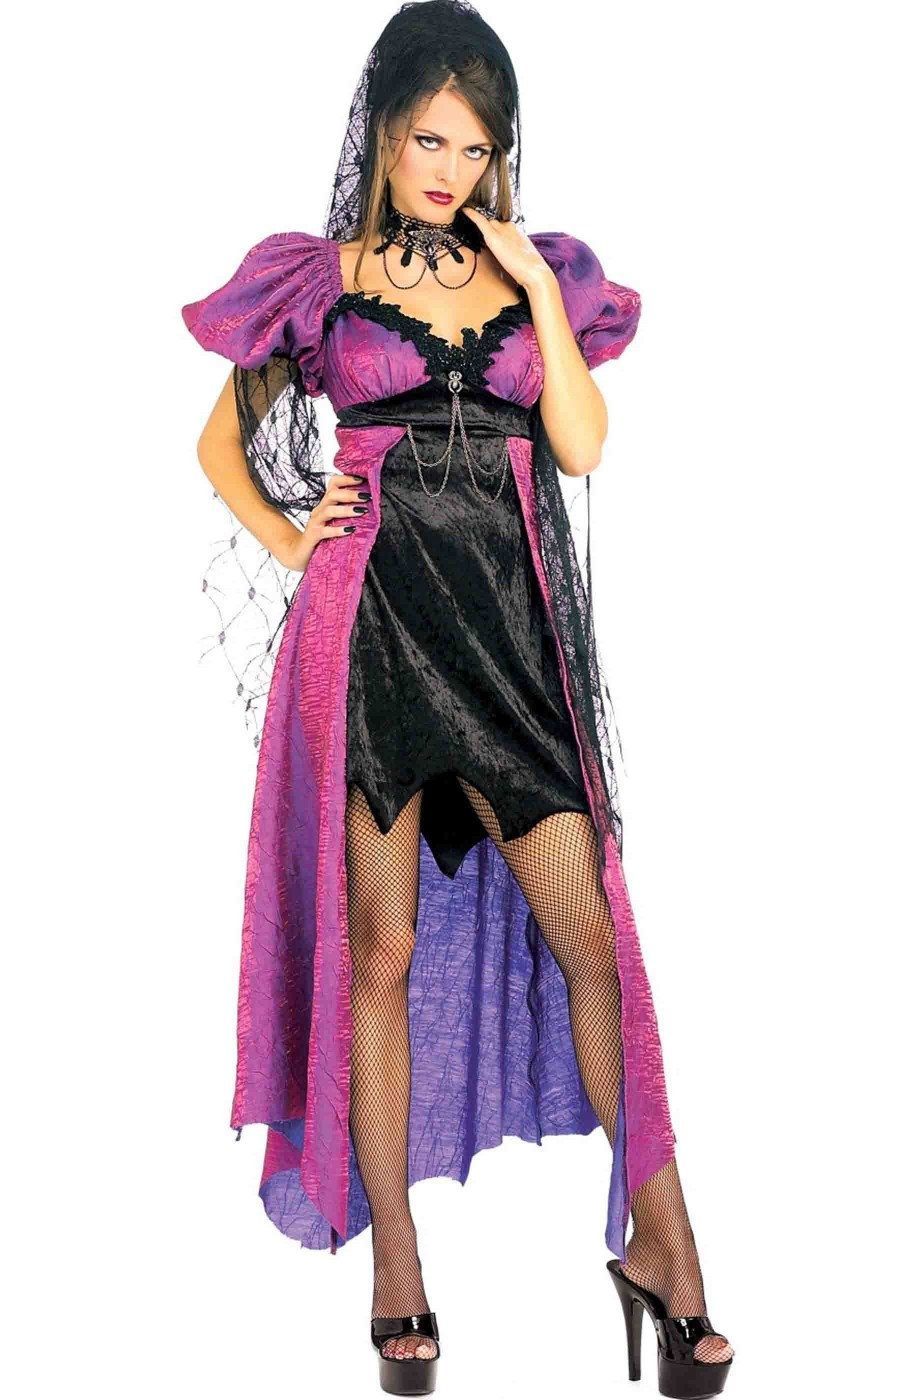 990ef034952b Costume Halloween donna principessa vampira lunga dietro corta davanti